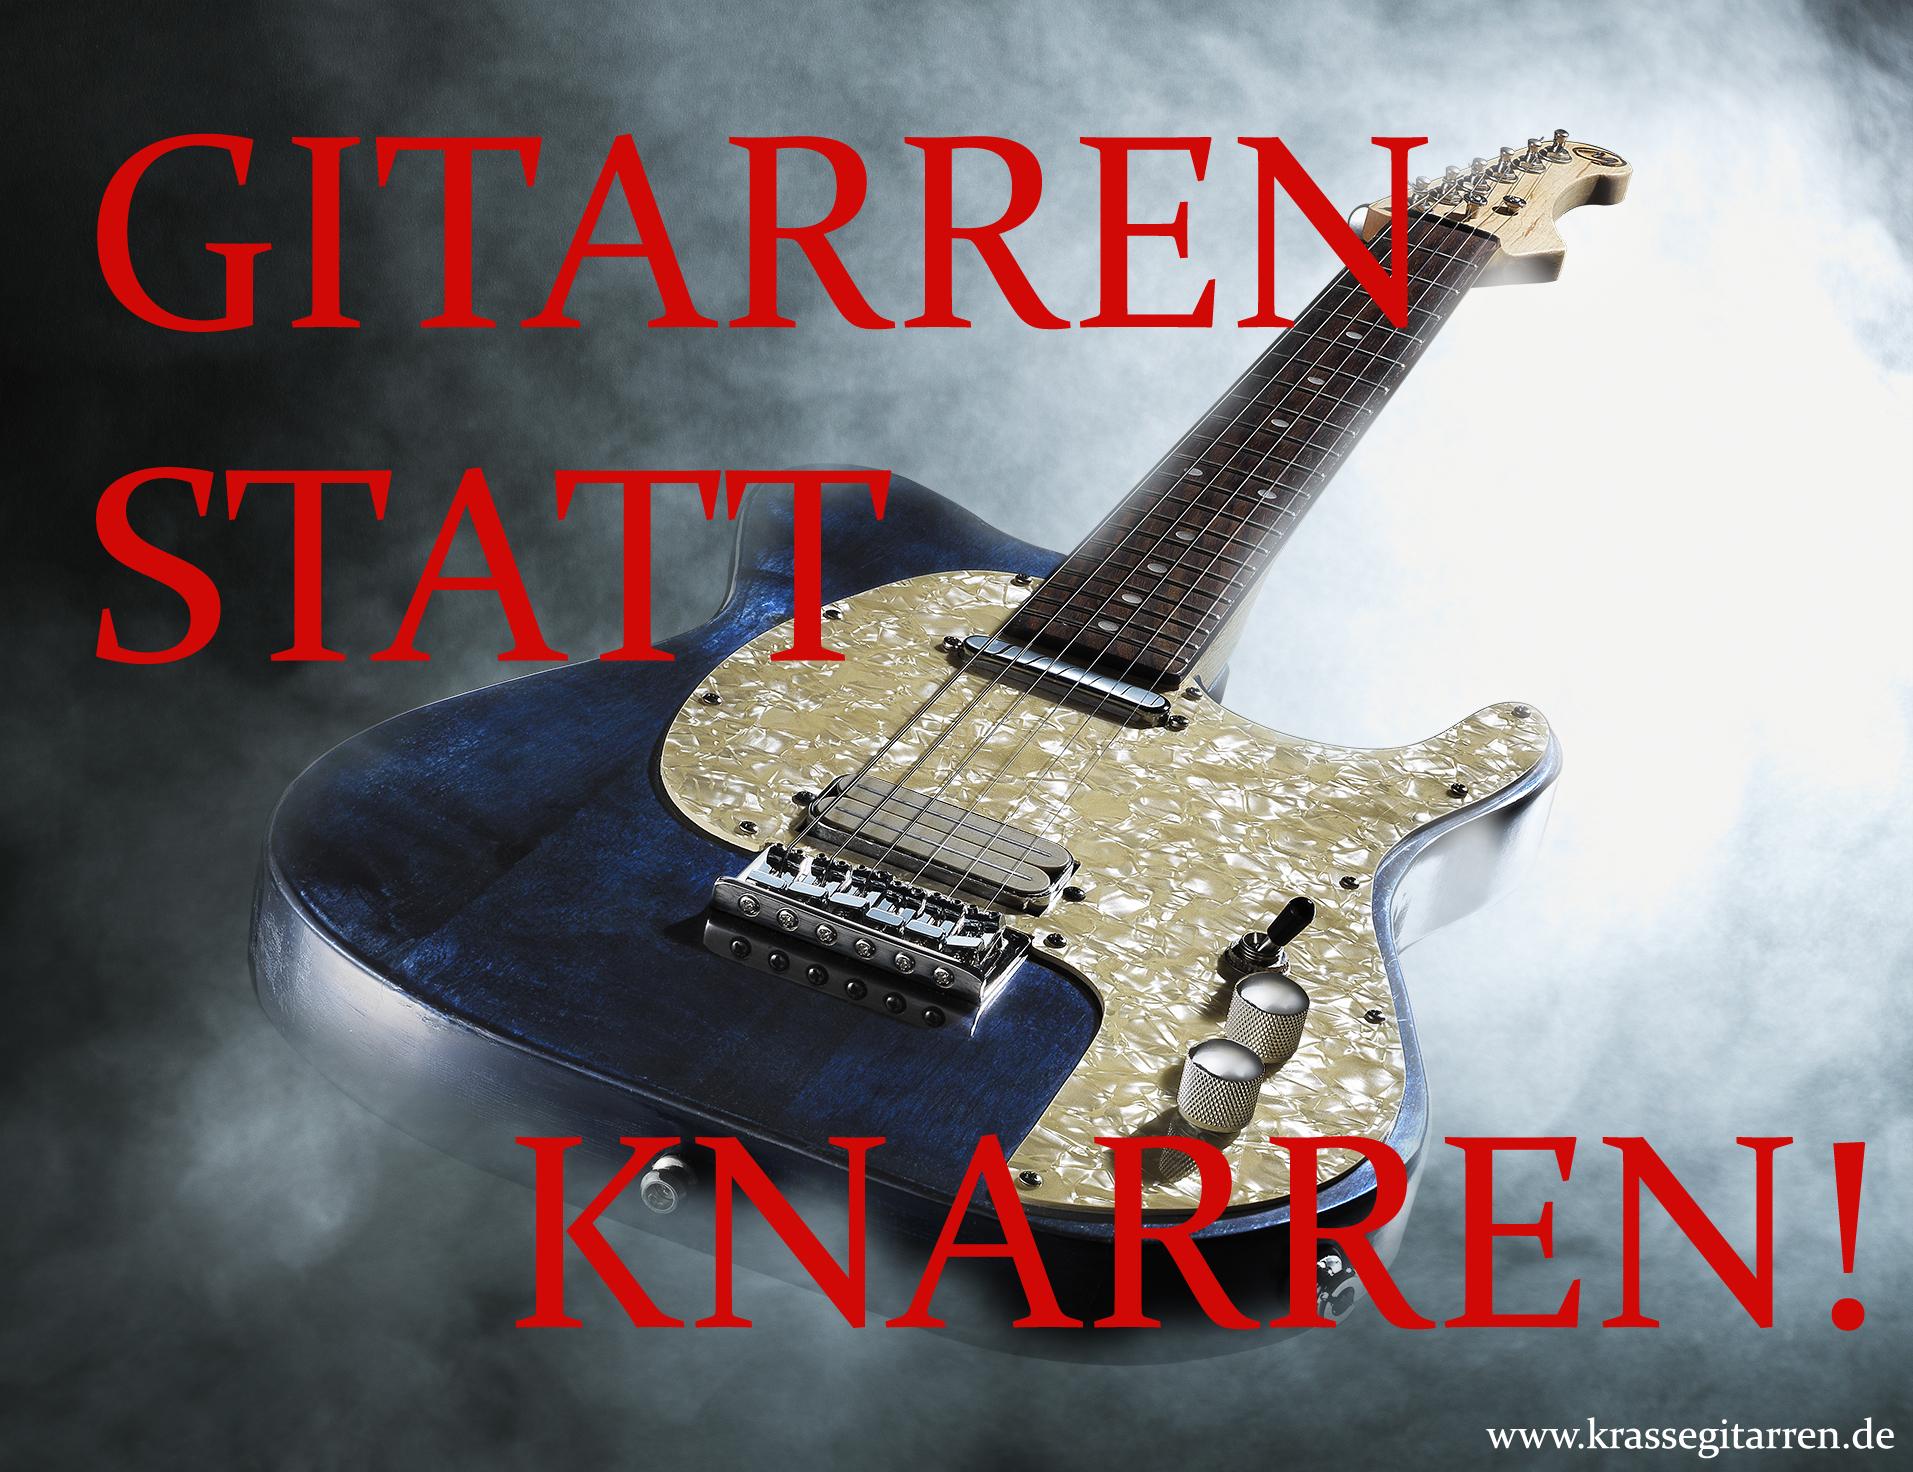 gitarren statt knarren